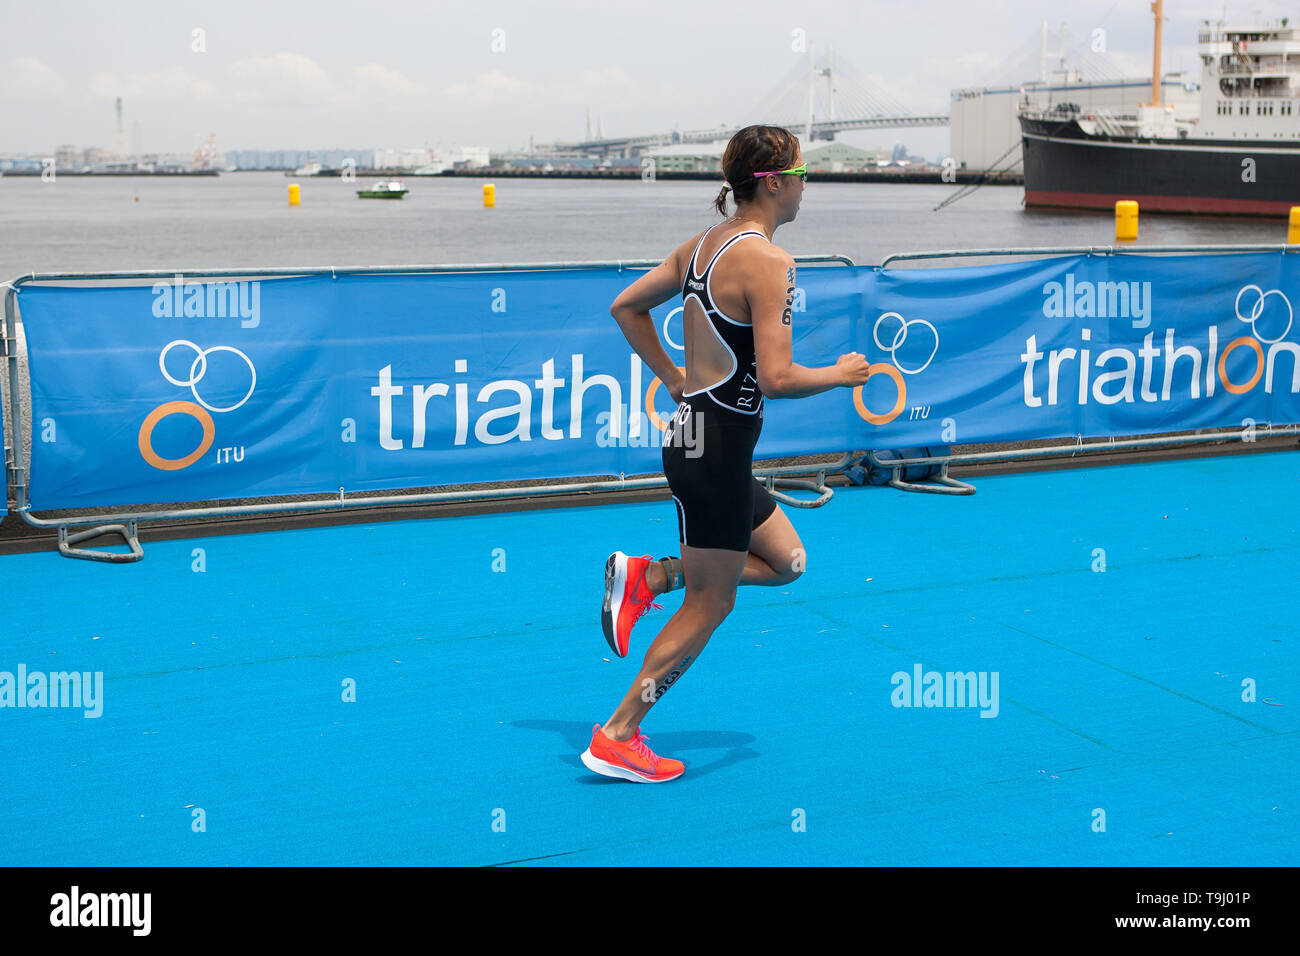 Yokohama, Japan. 18th May, 2019. 2019 ITU World Triathlon, World Paratriathlon Yokohama at Yamashita Park and Minato Mirai, Yokohama. Sato (Photos by Michael Steinebach/AFLO) Credit: Aflo Co. Ltd./Alamy Live News Stock Photo